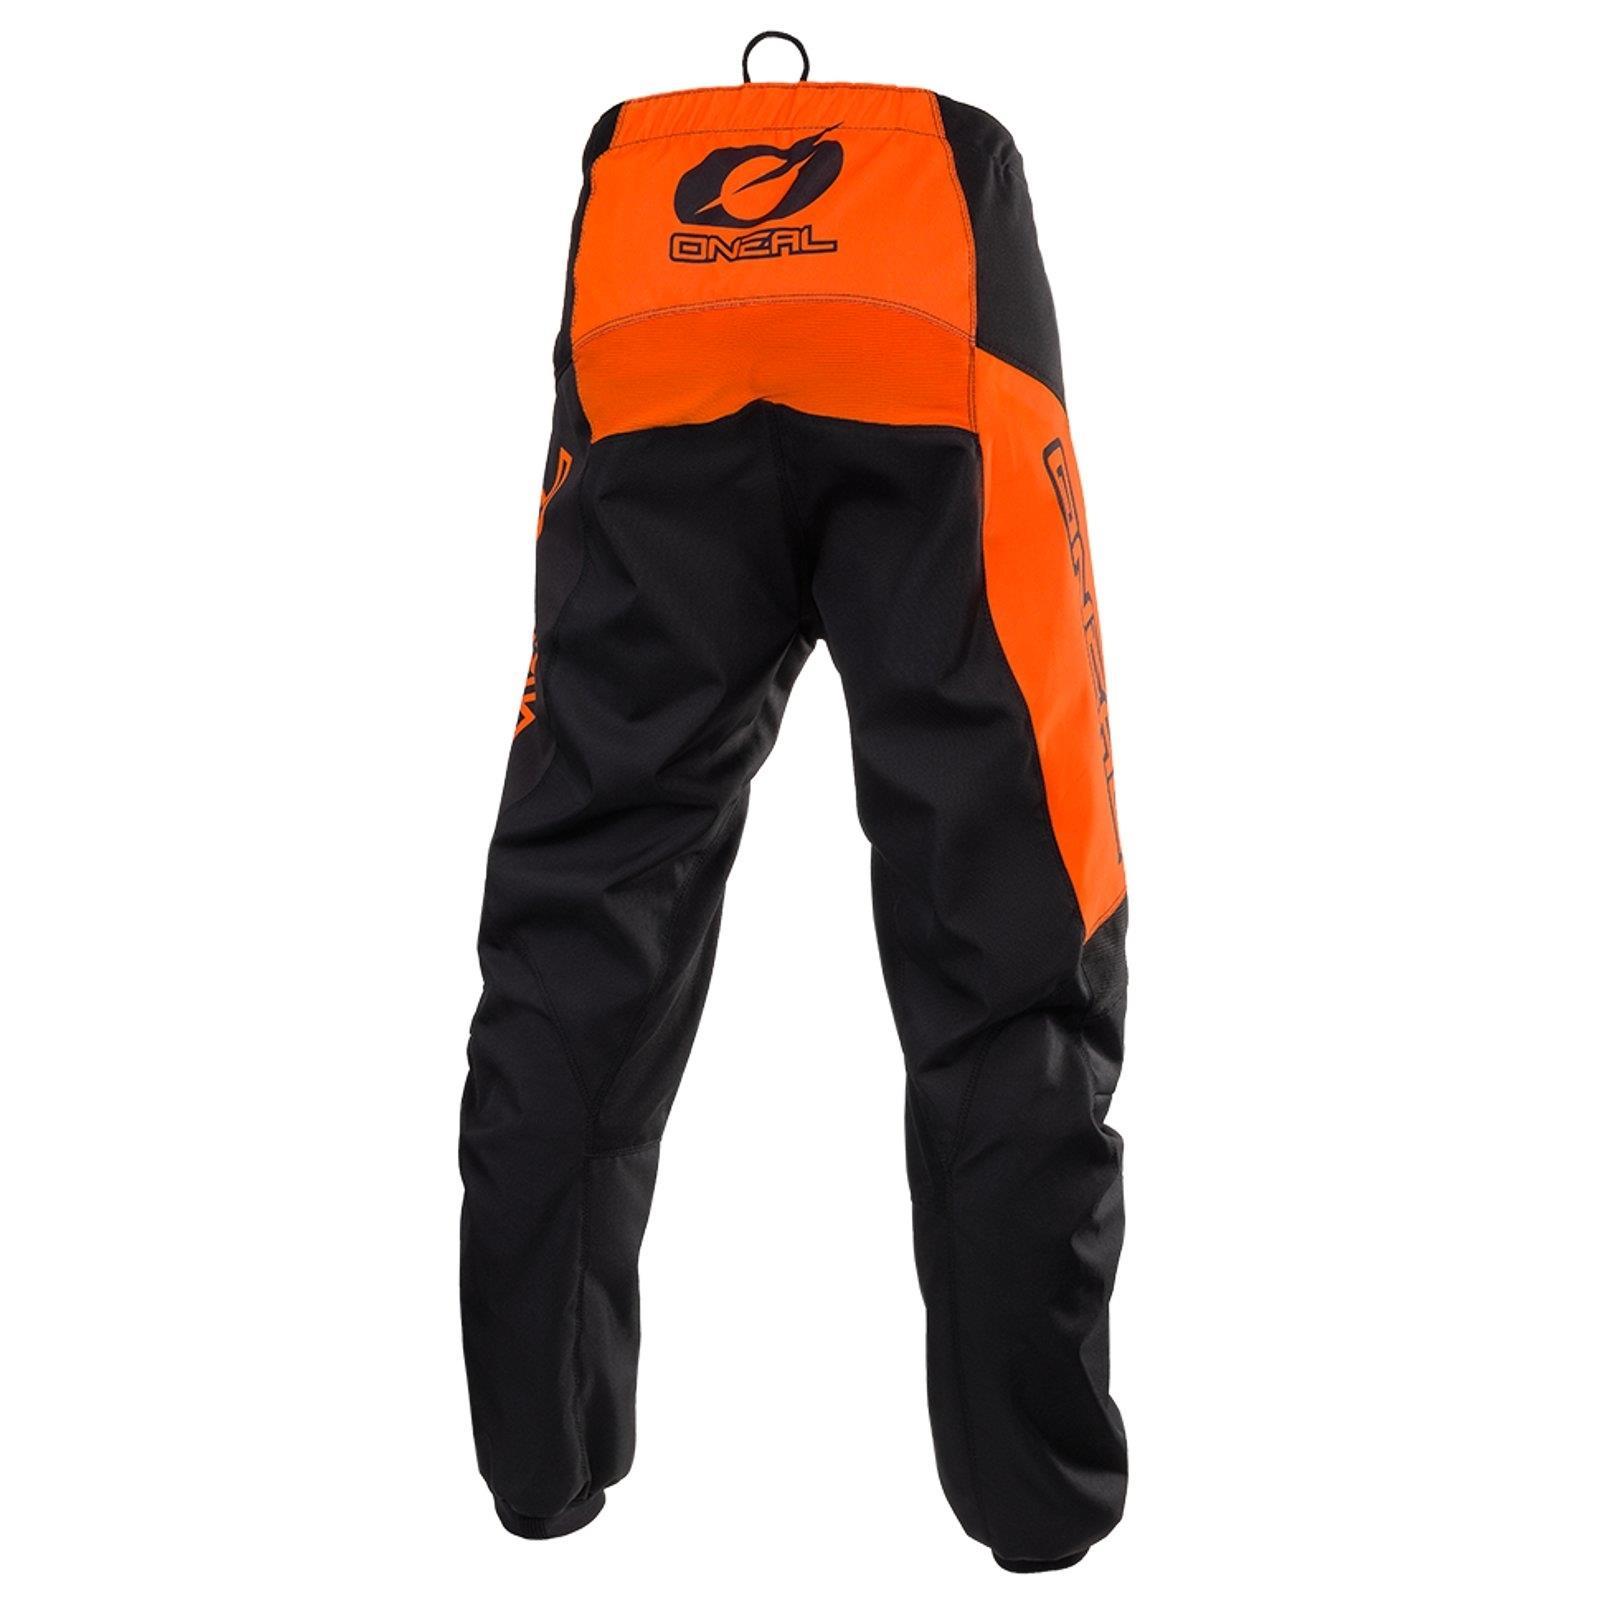 Oneal-elemento-Mayhem-Hardwear-Pants-pantalones-MX-DH-FR-Moto-Cross-Enduro-MTB-moto miniatura 19